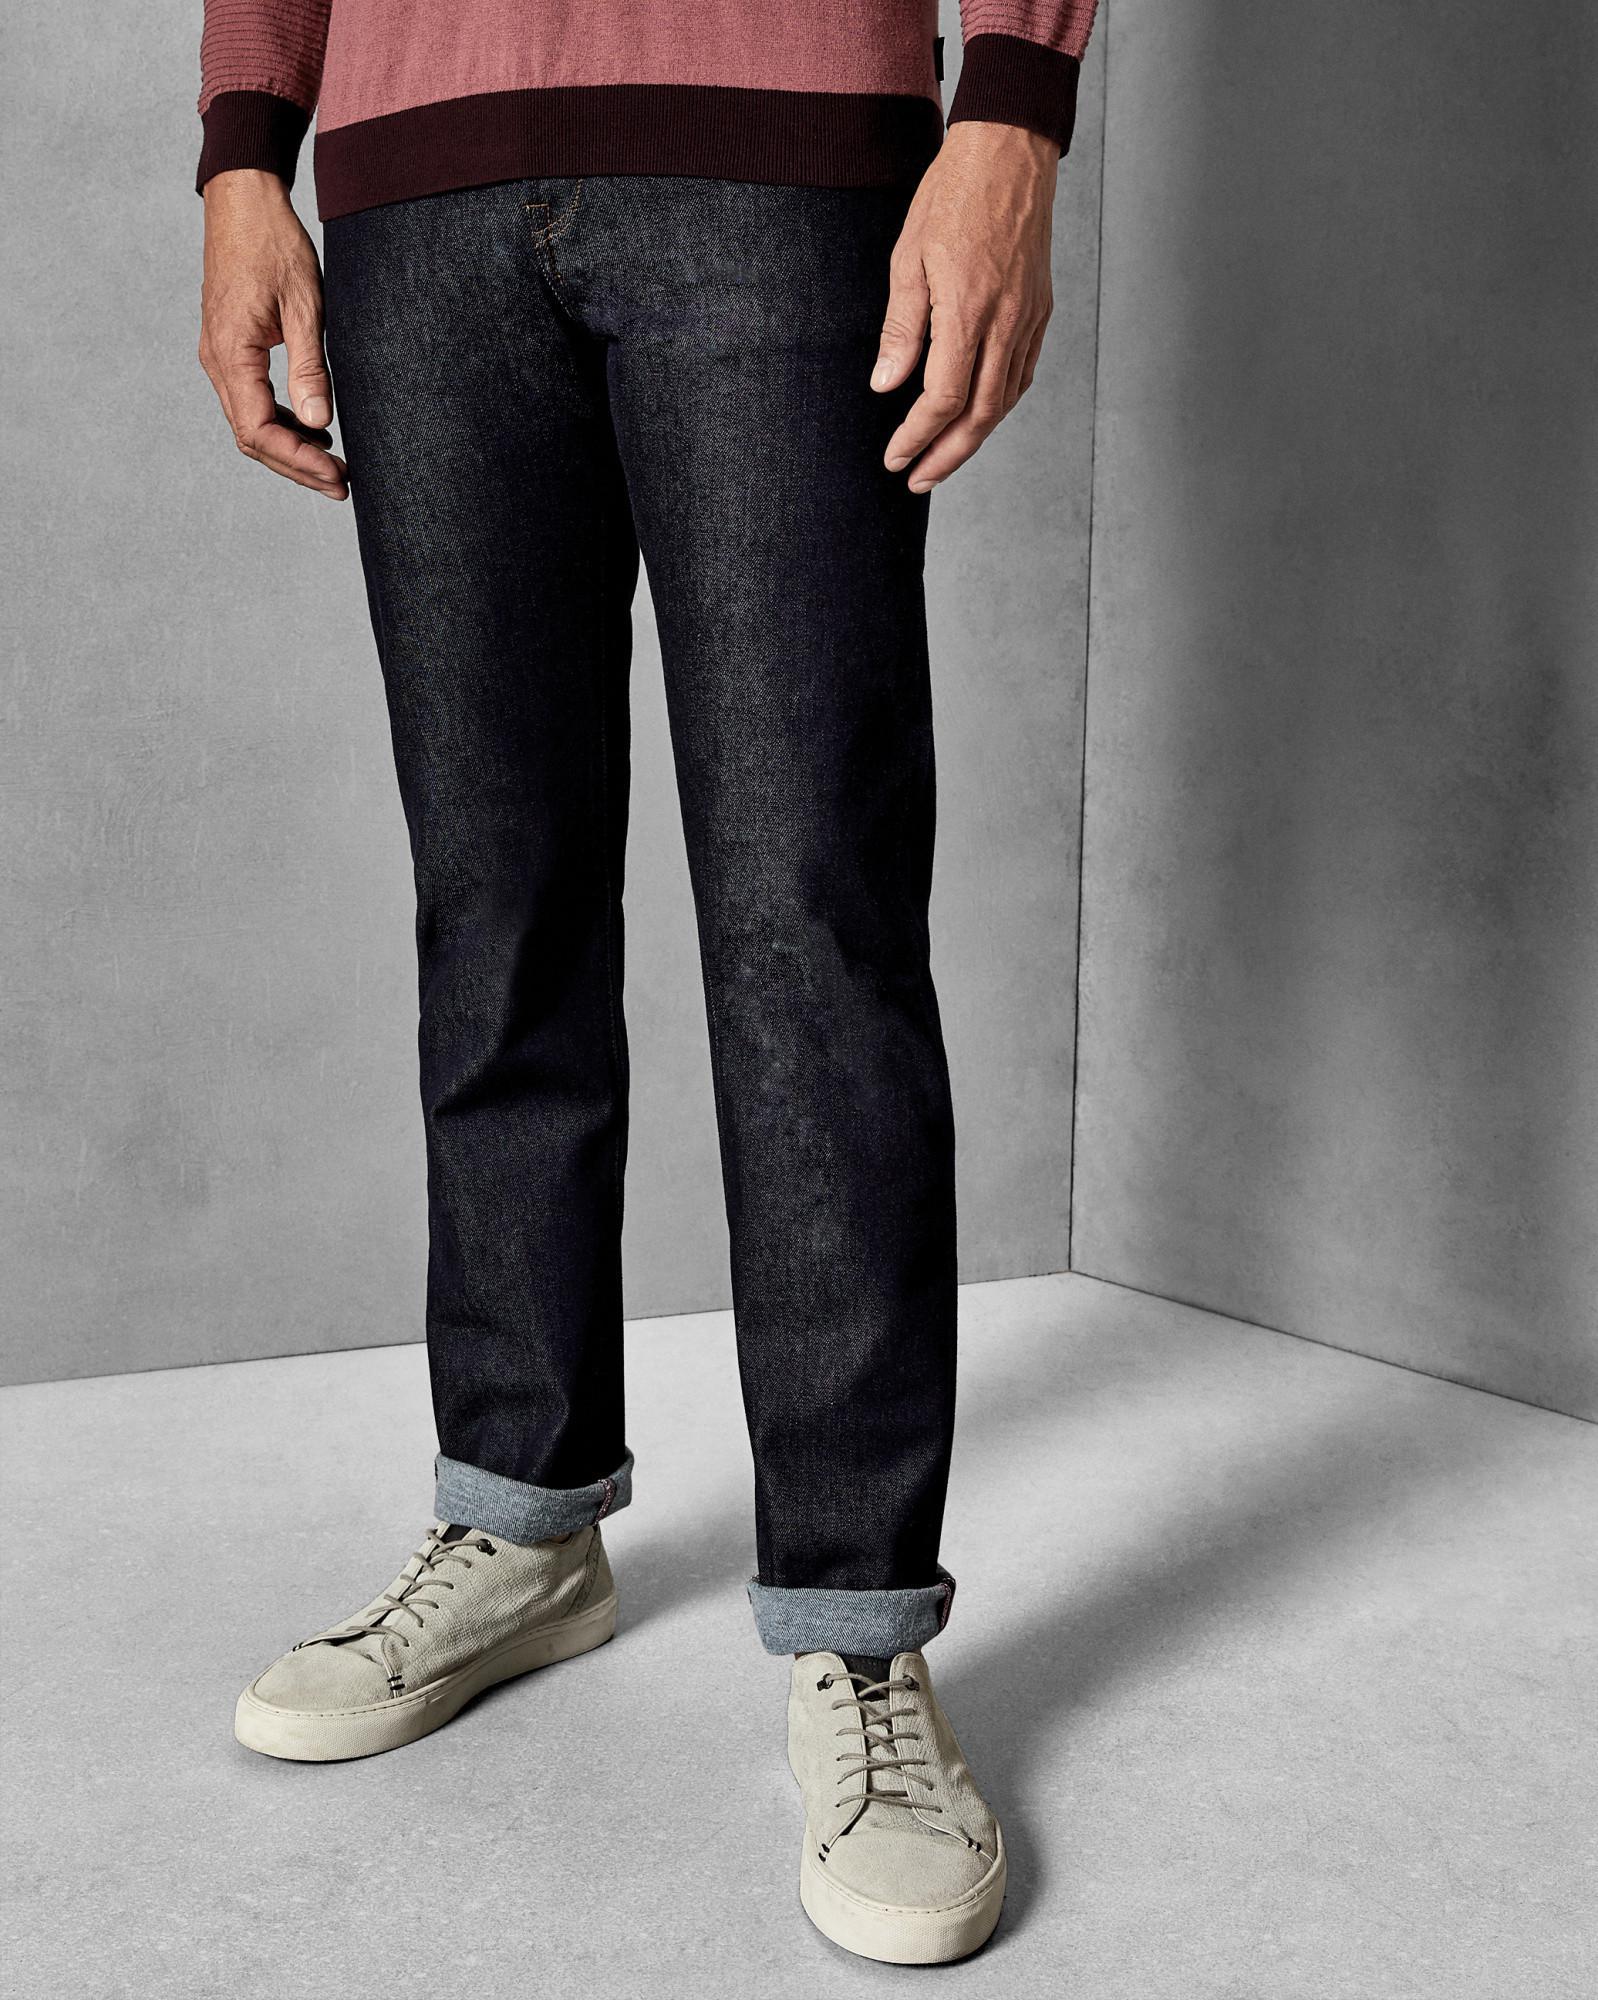 09d923bb5f05 Ted Baker Original Fit Tall Brushed Denim Jeans in Blue for Men - Lyst